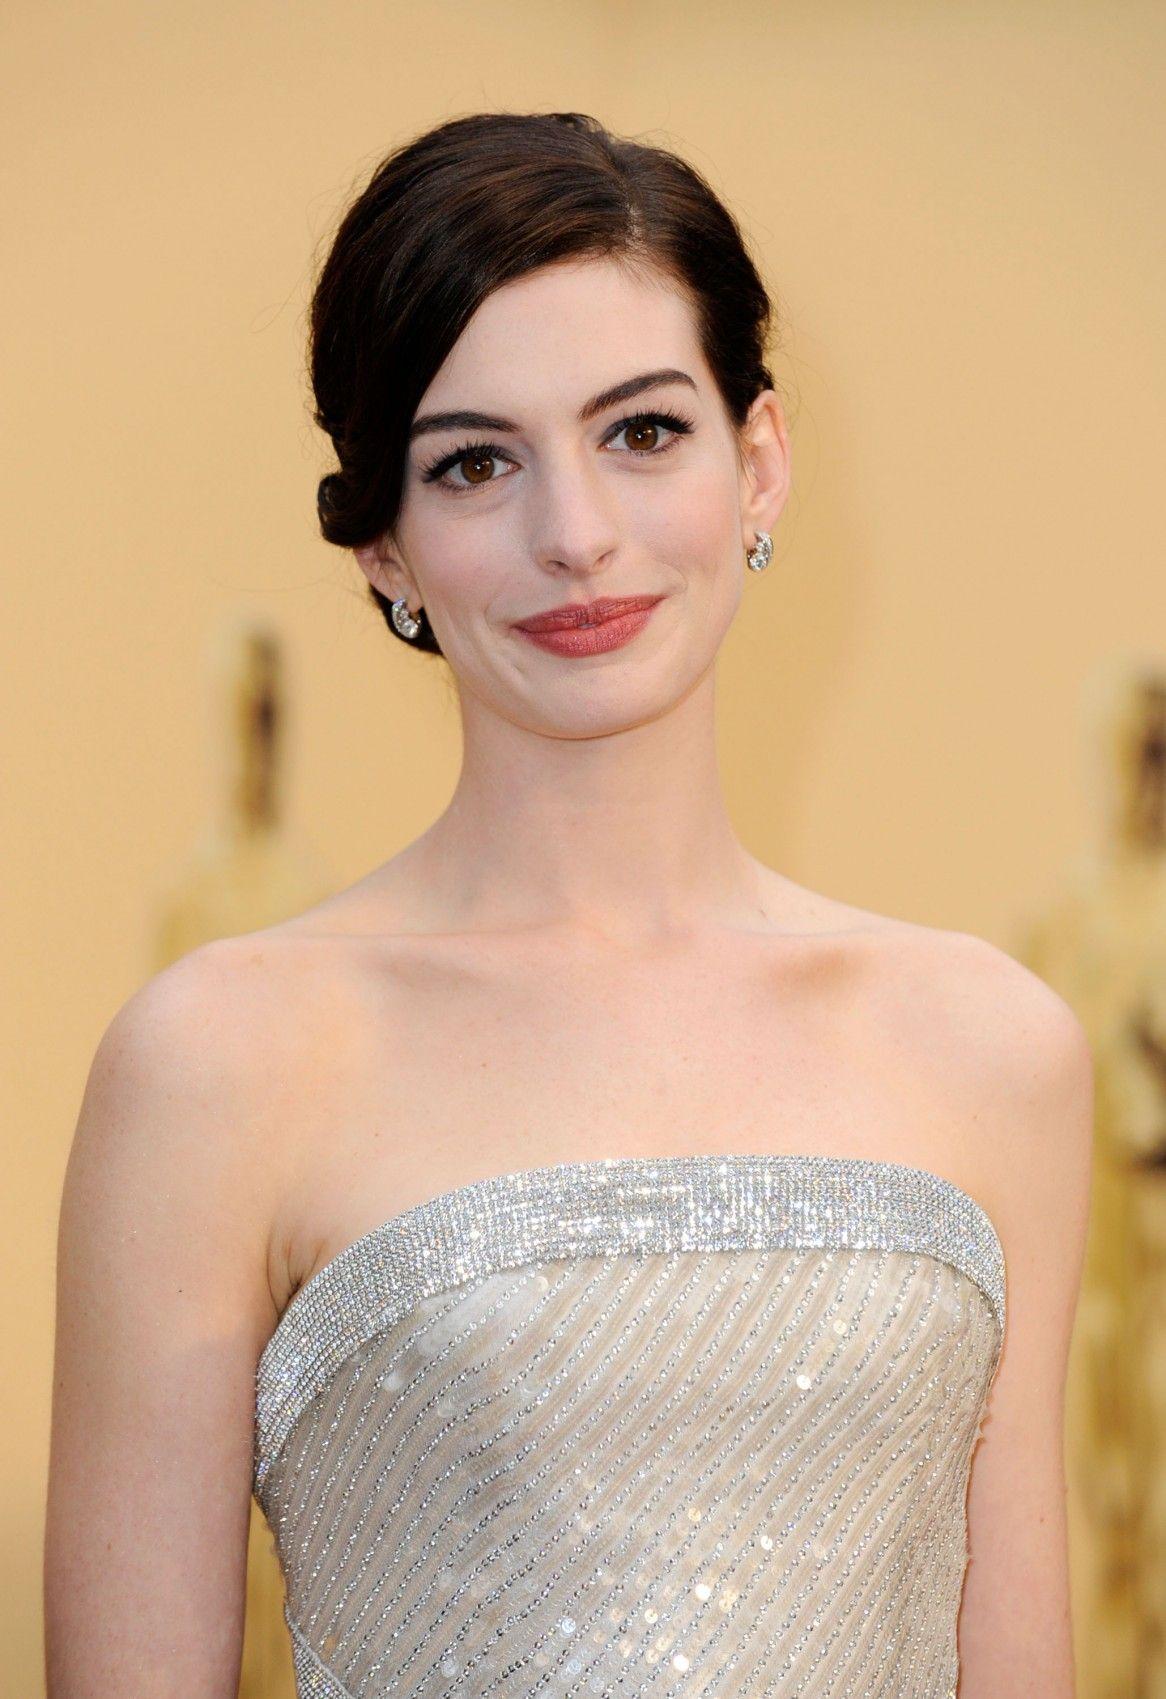 Anne Hathaway 格架 开心集品 【アンハサウェイの画像】映画「レ・ミゼラブル」で丸刈りに